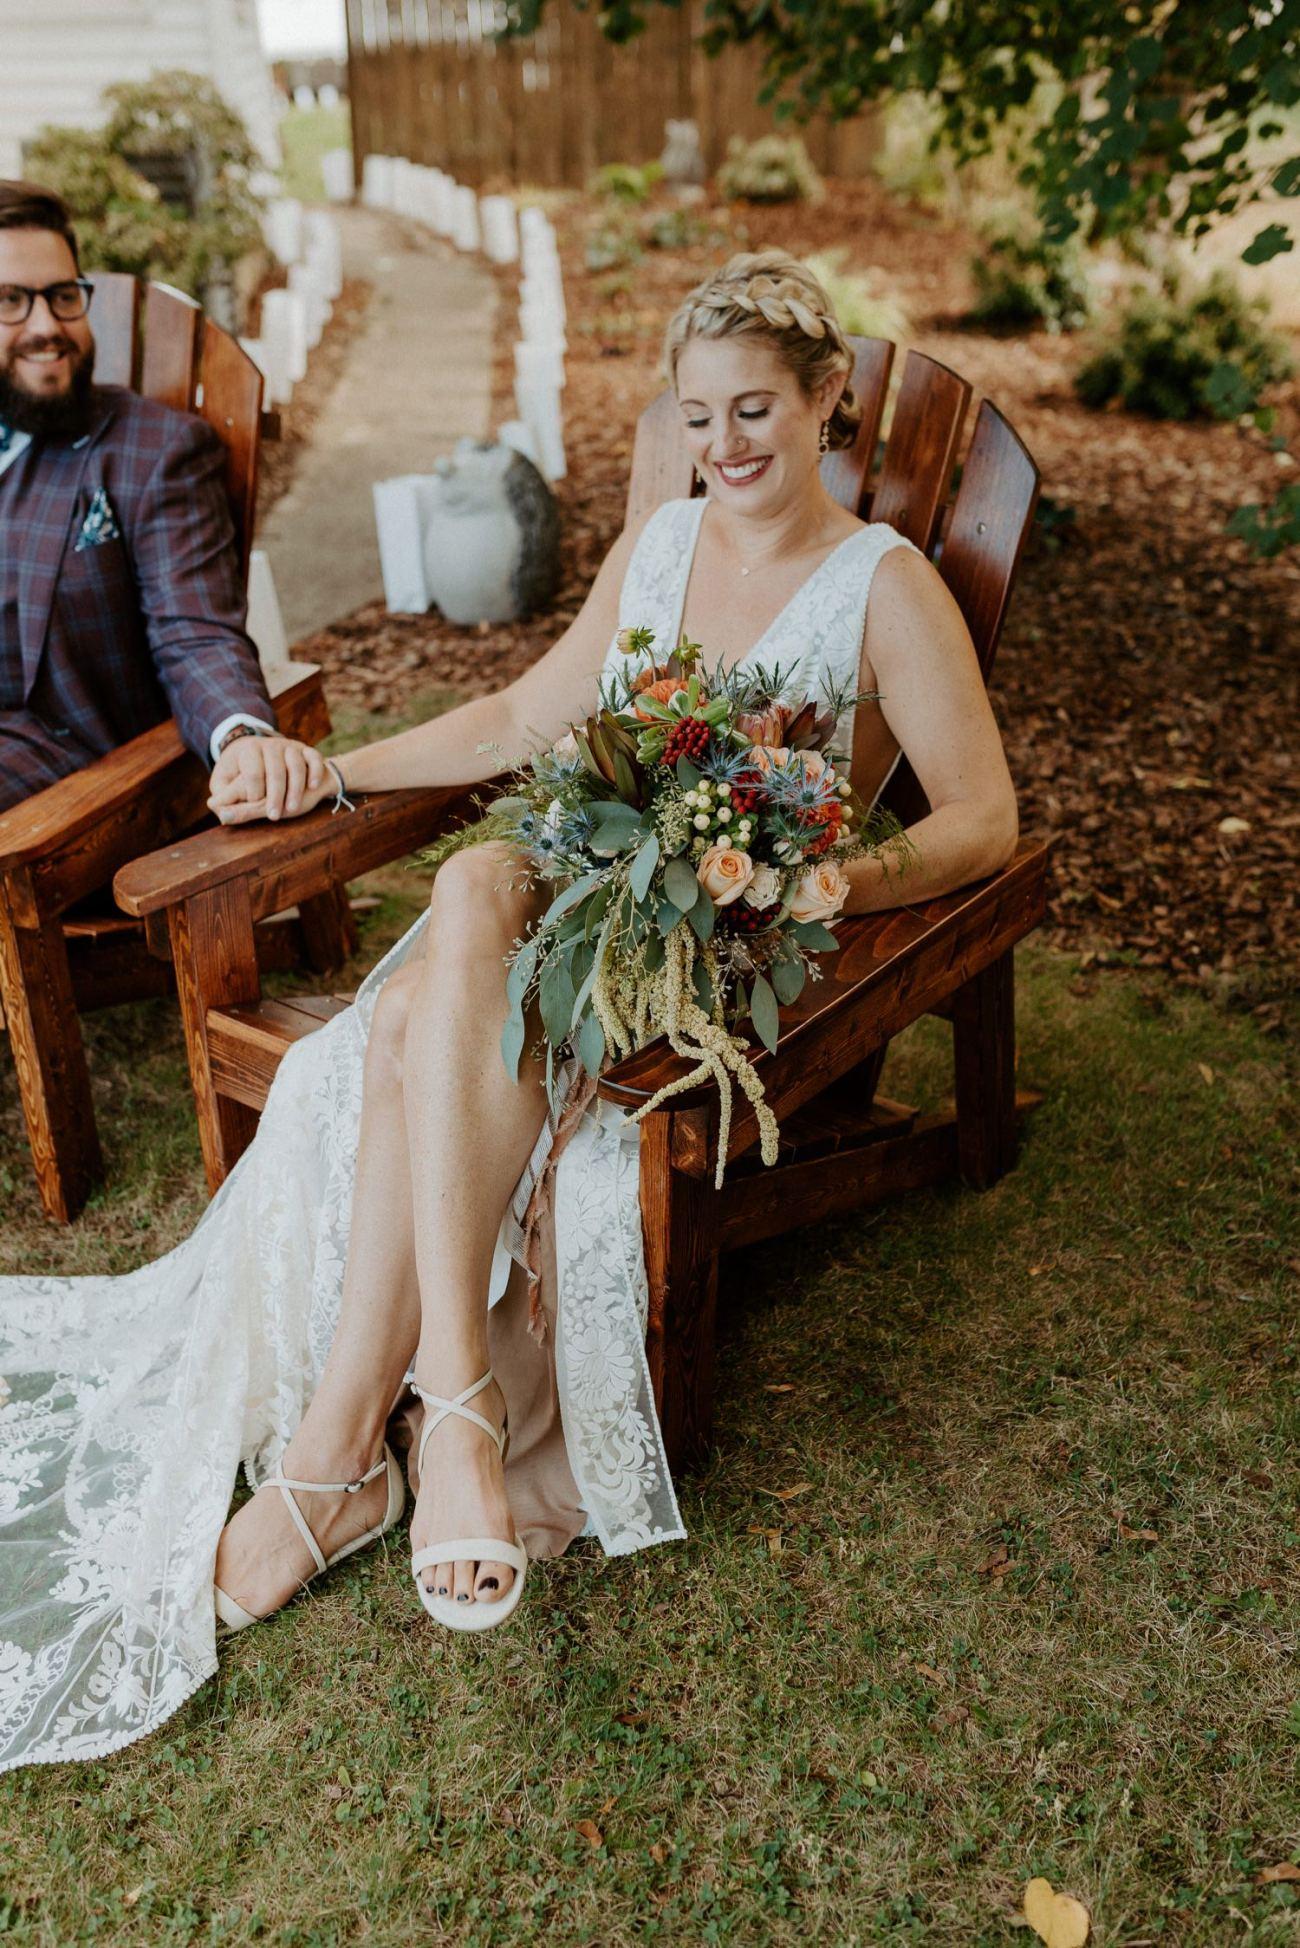 New Jersey Fall Backyard Wedding Bend Wedding Photographer NJ Wedding Photographer Anais Possamai Photography 013